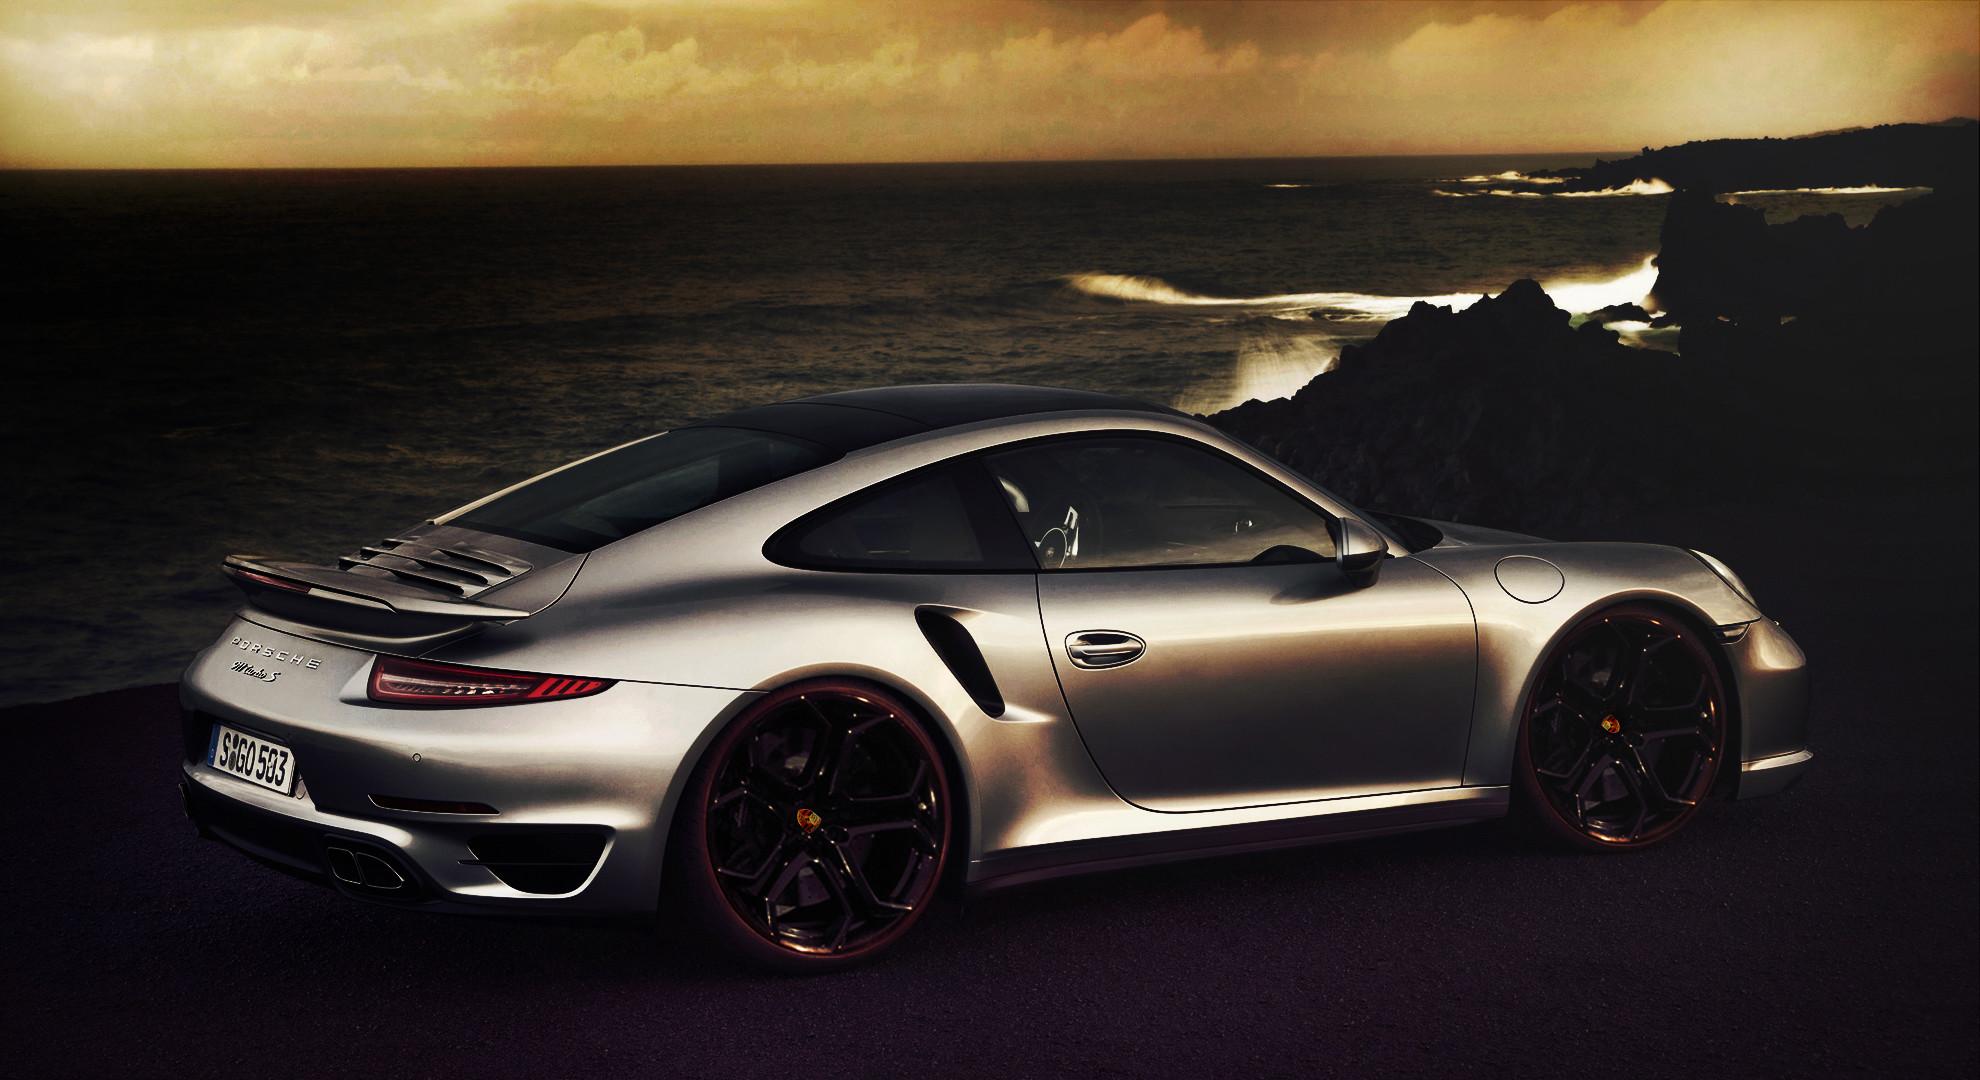 Porsche Wallpaper Martini Image Wheels Pinterest - Porsche Turbo S Wallpaper Hd - HD Wallpaper